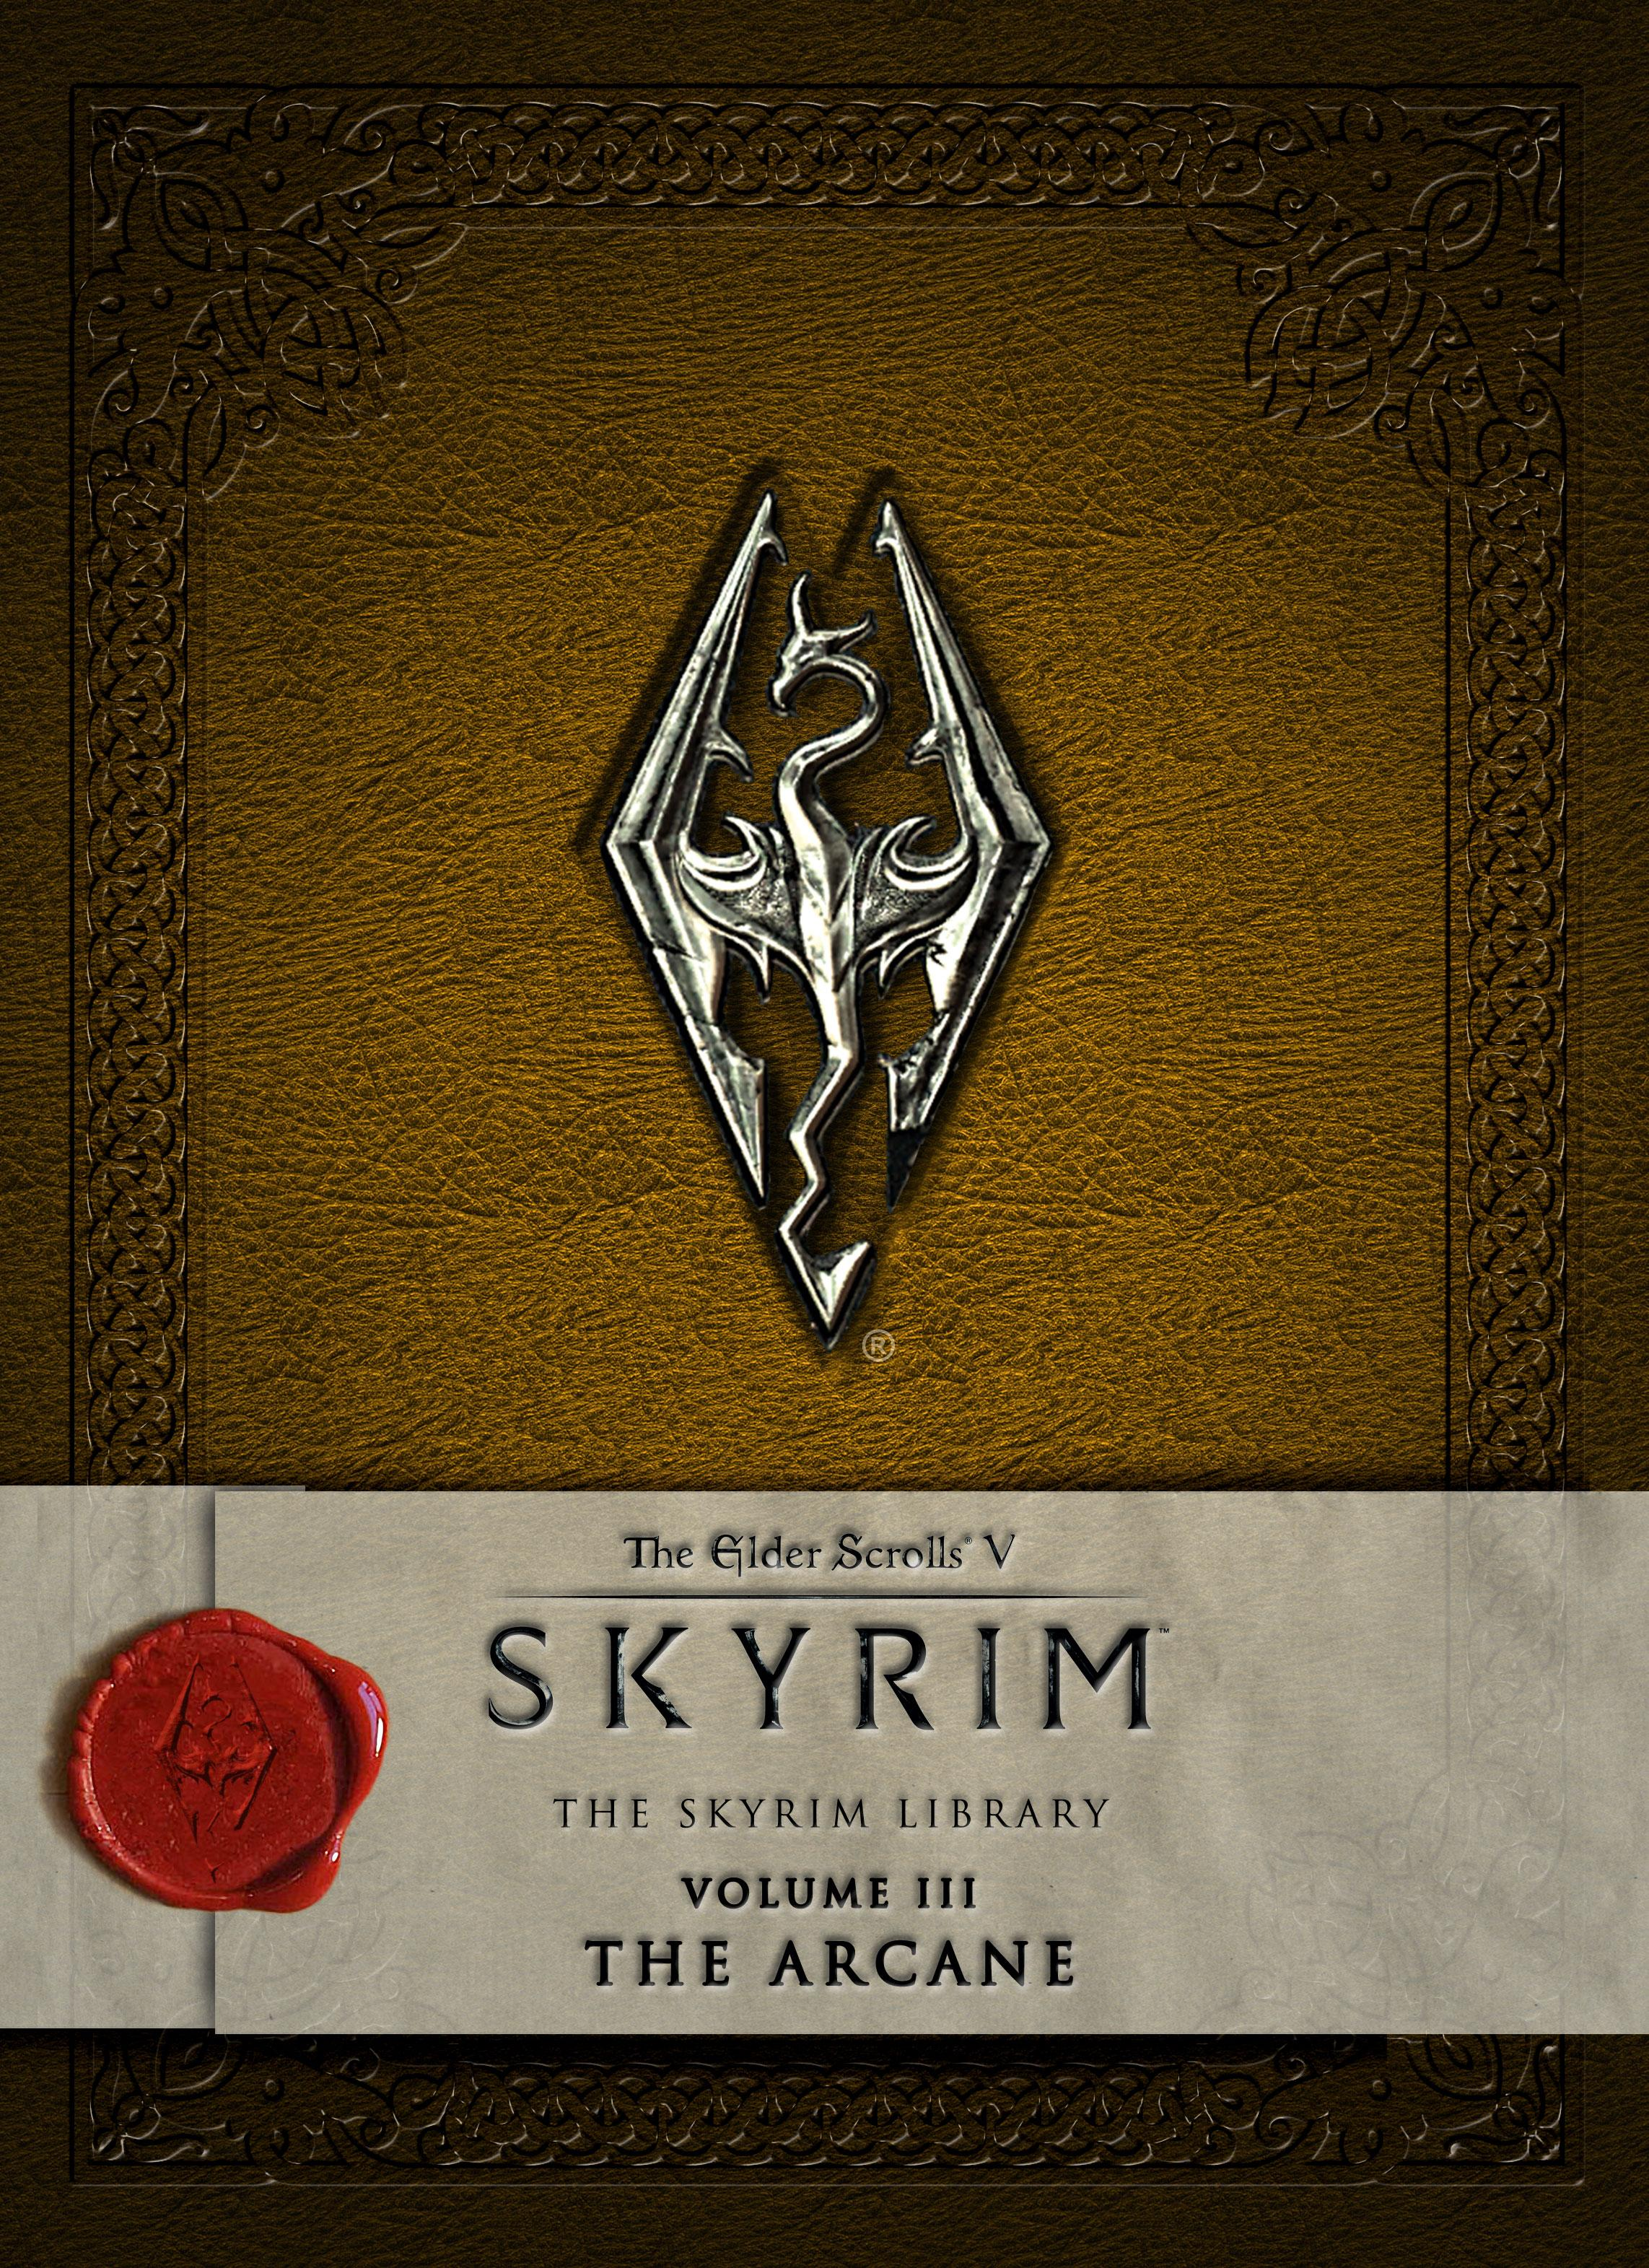 elder scrolls online gold edition ps4 The Elder Scrolls V: Skyrim - The Skyrim Library, Vol. III: The Arcane